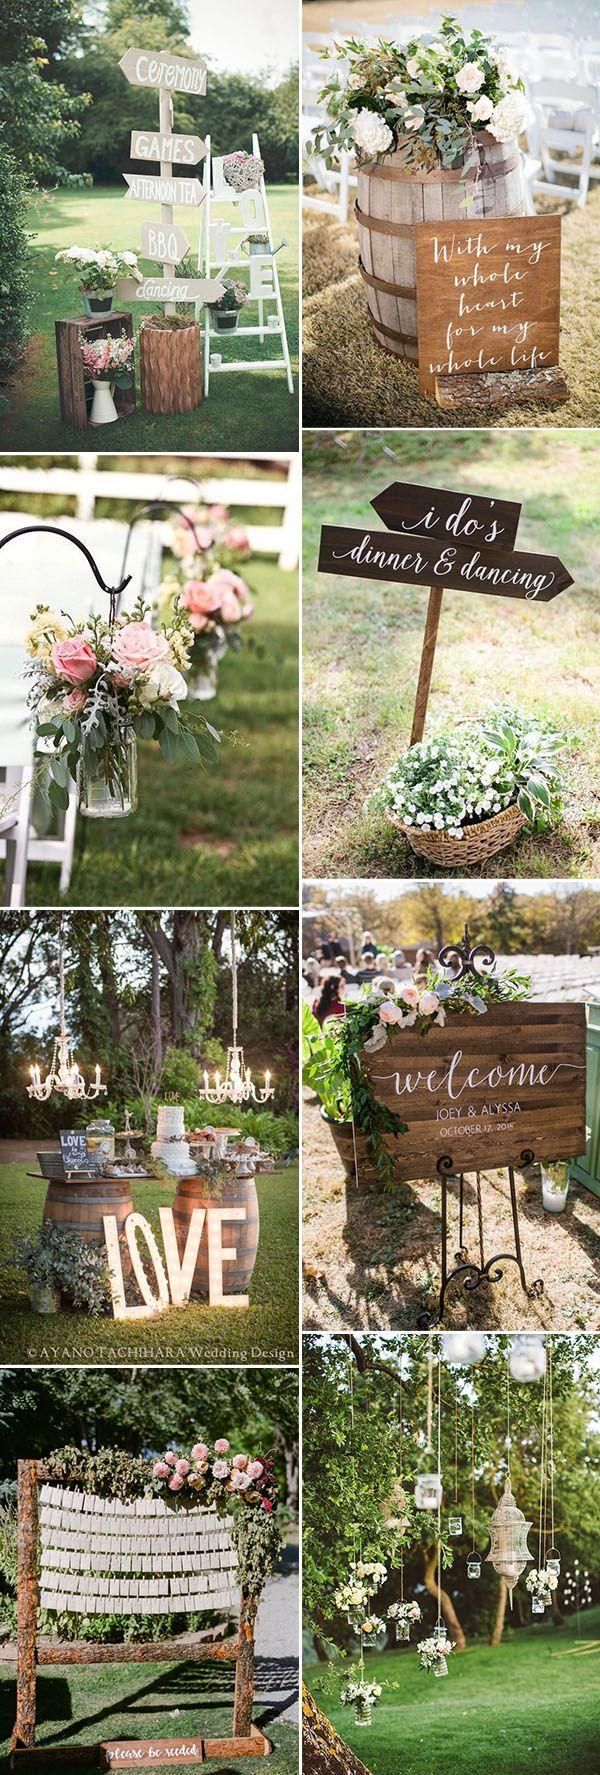 amazing garden wedding decor ideas that are easy to DIY